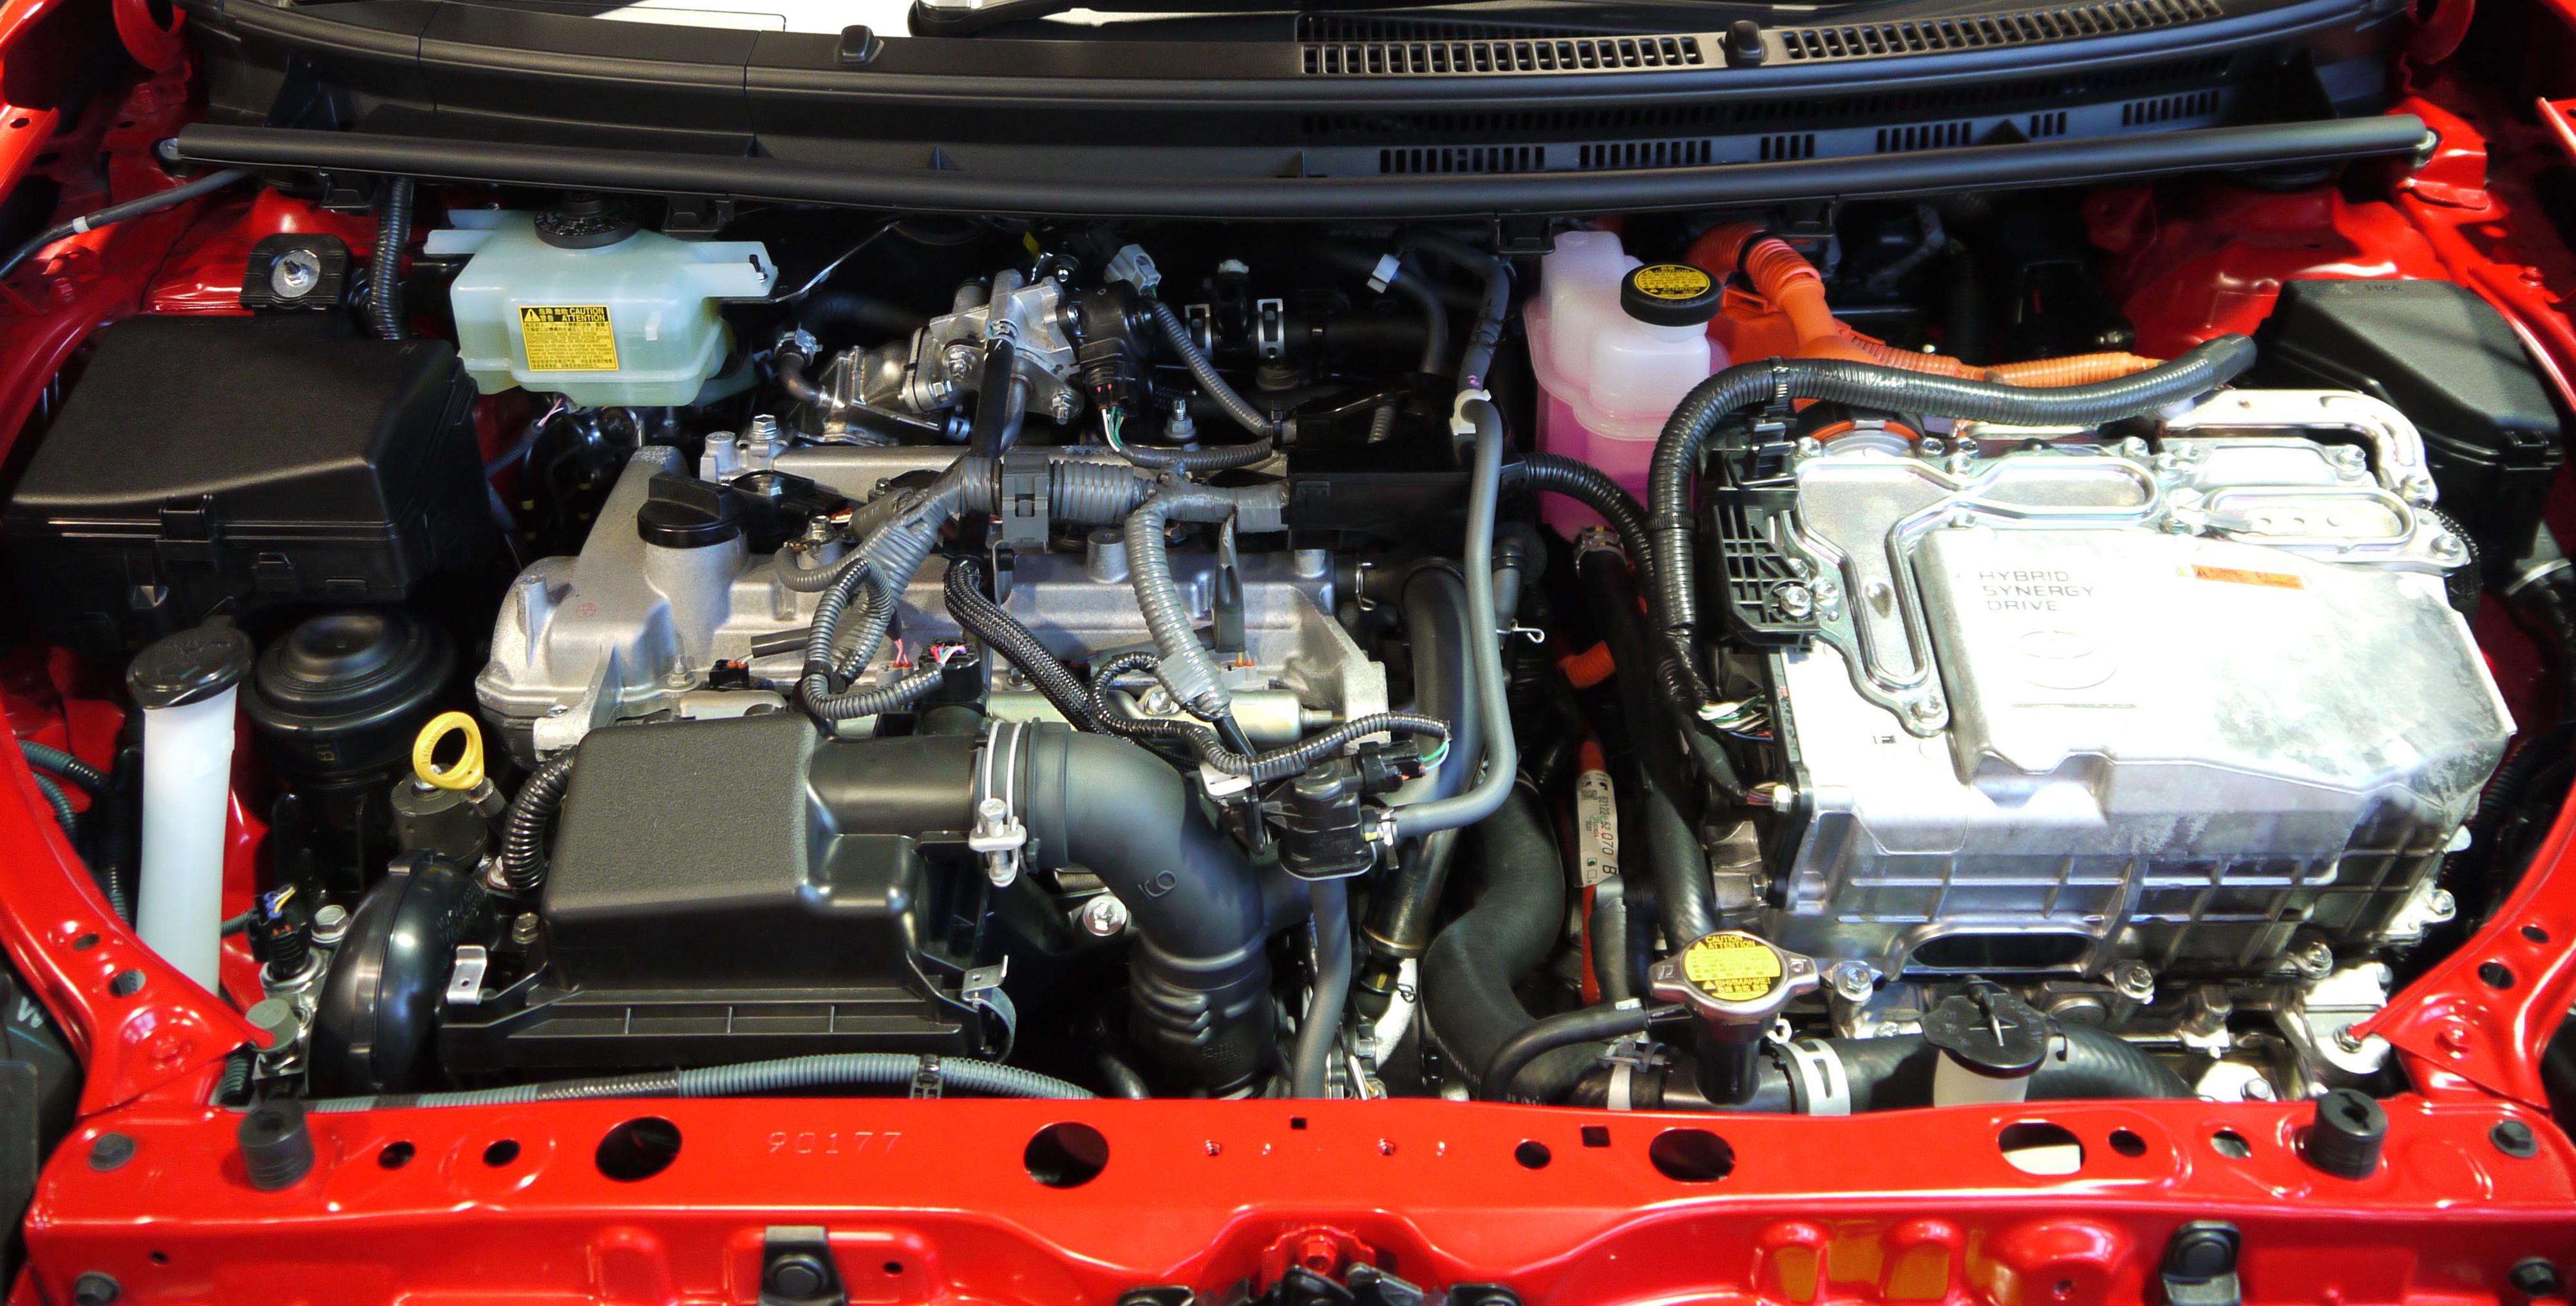 Qadya 39 S Cars And Real Time News Toyota Aqua Prius C The